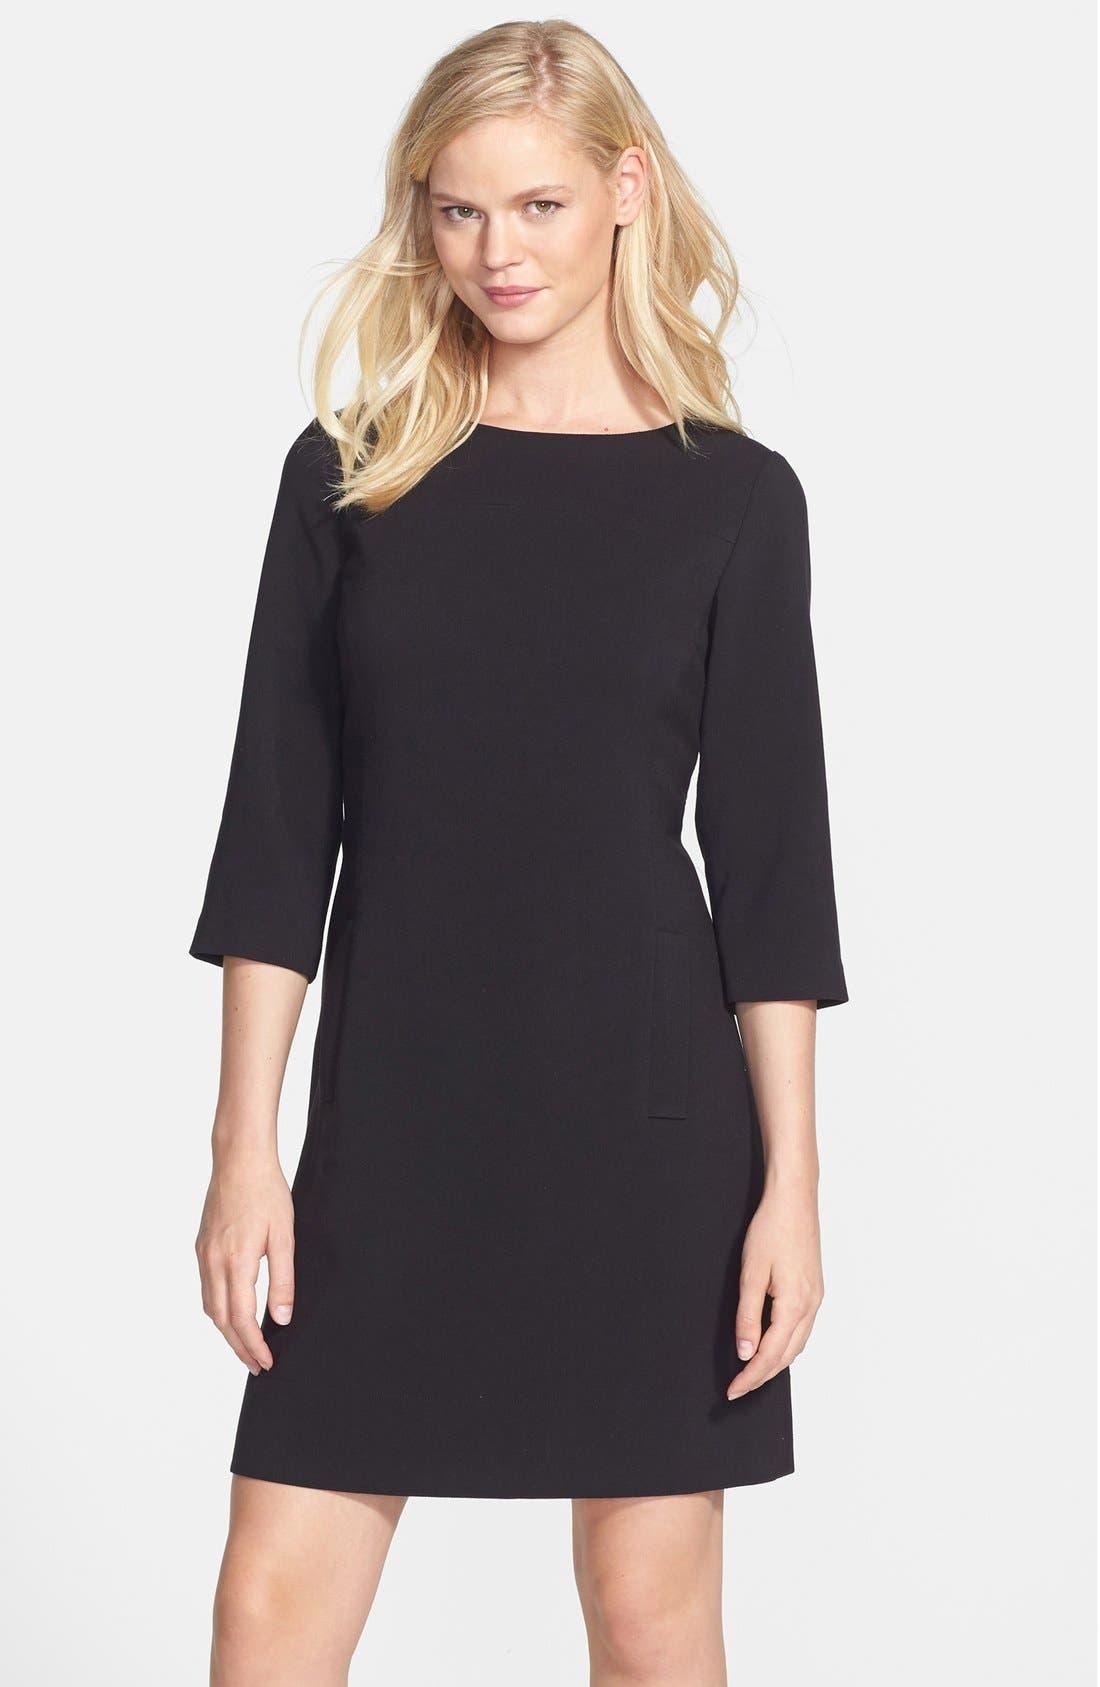 Alternate Image 1 Selected - Eliza J Knit Shift Dress (Regular & Petite)